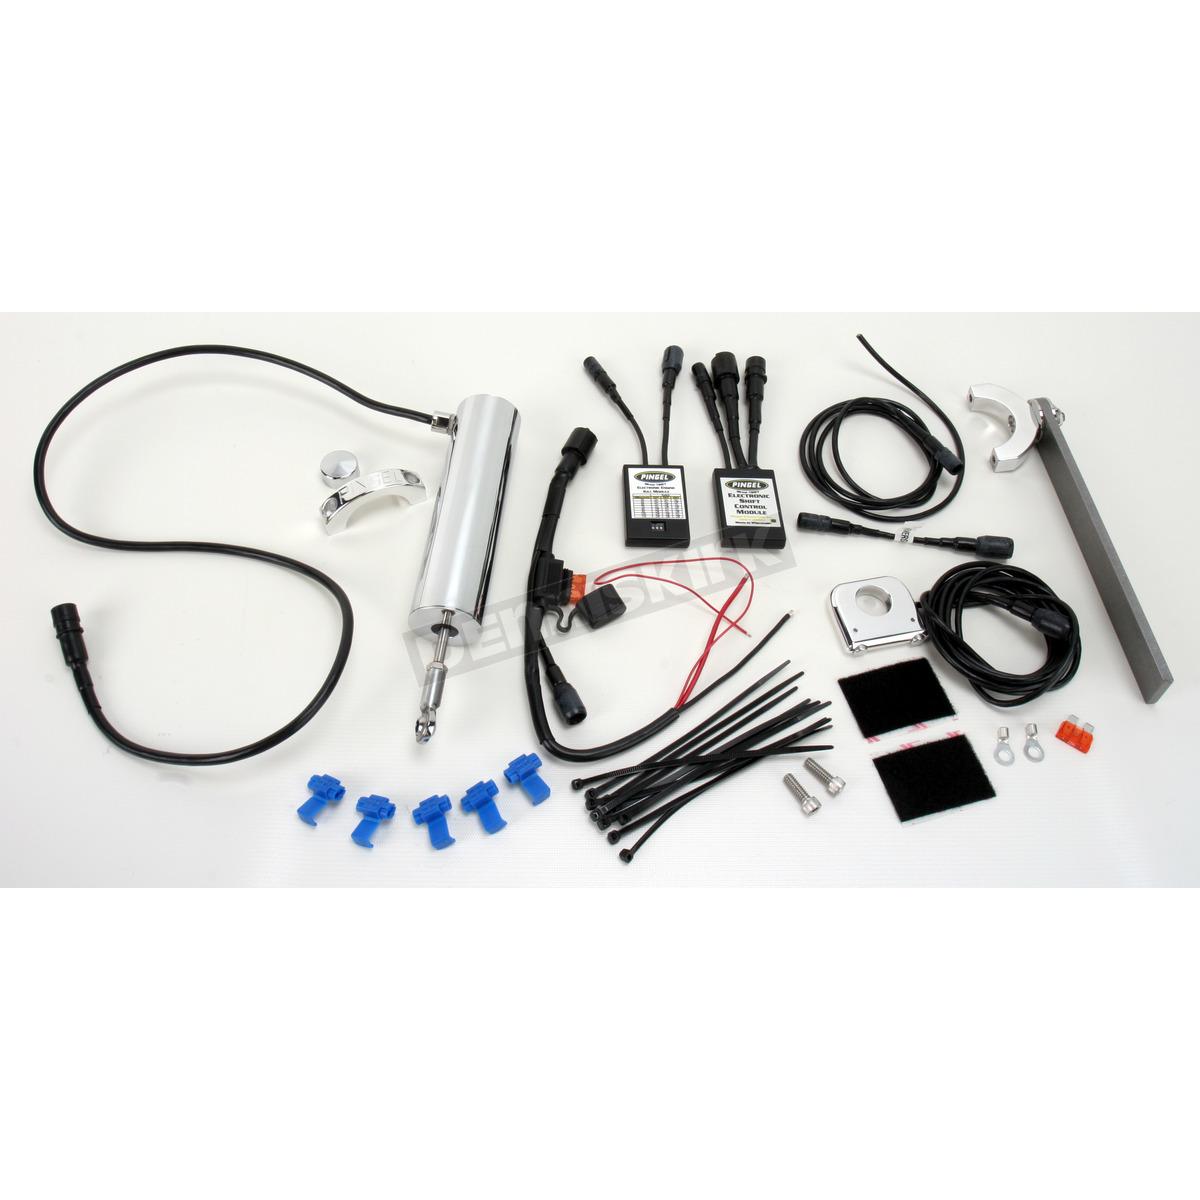 hight resolution of  pingel air shifter wiring diagram wiring diagram on engine wiring diagram delay box wiring